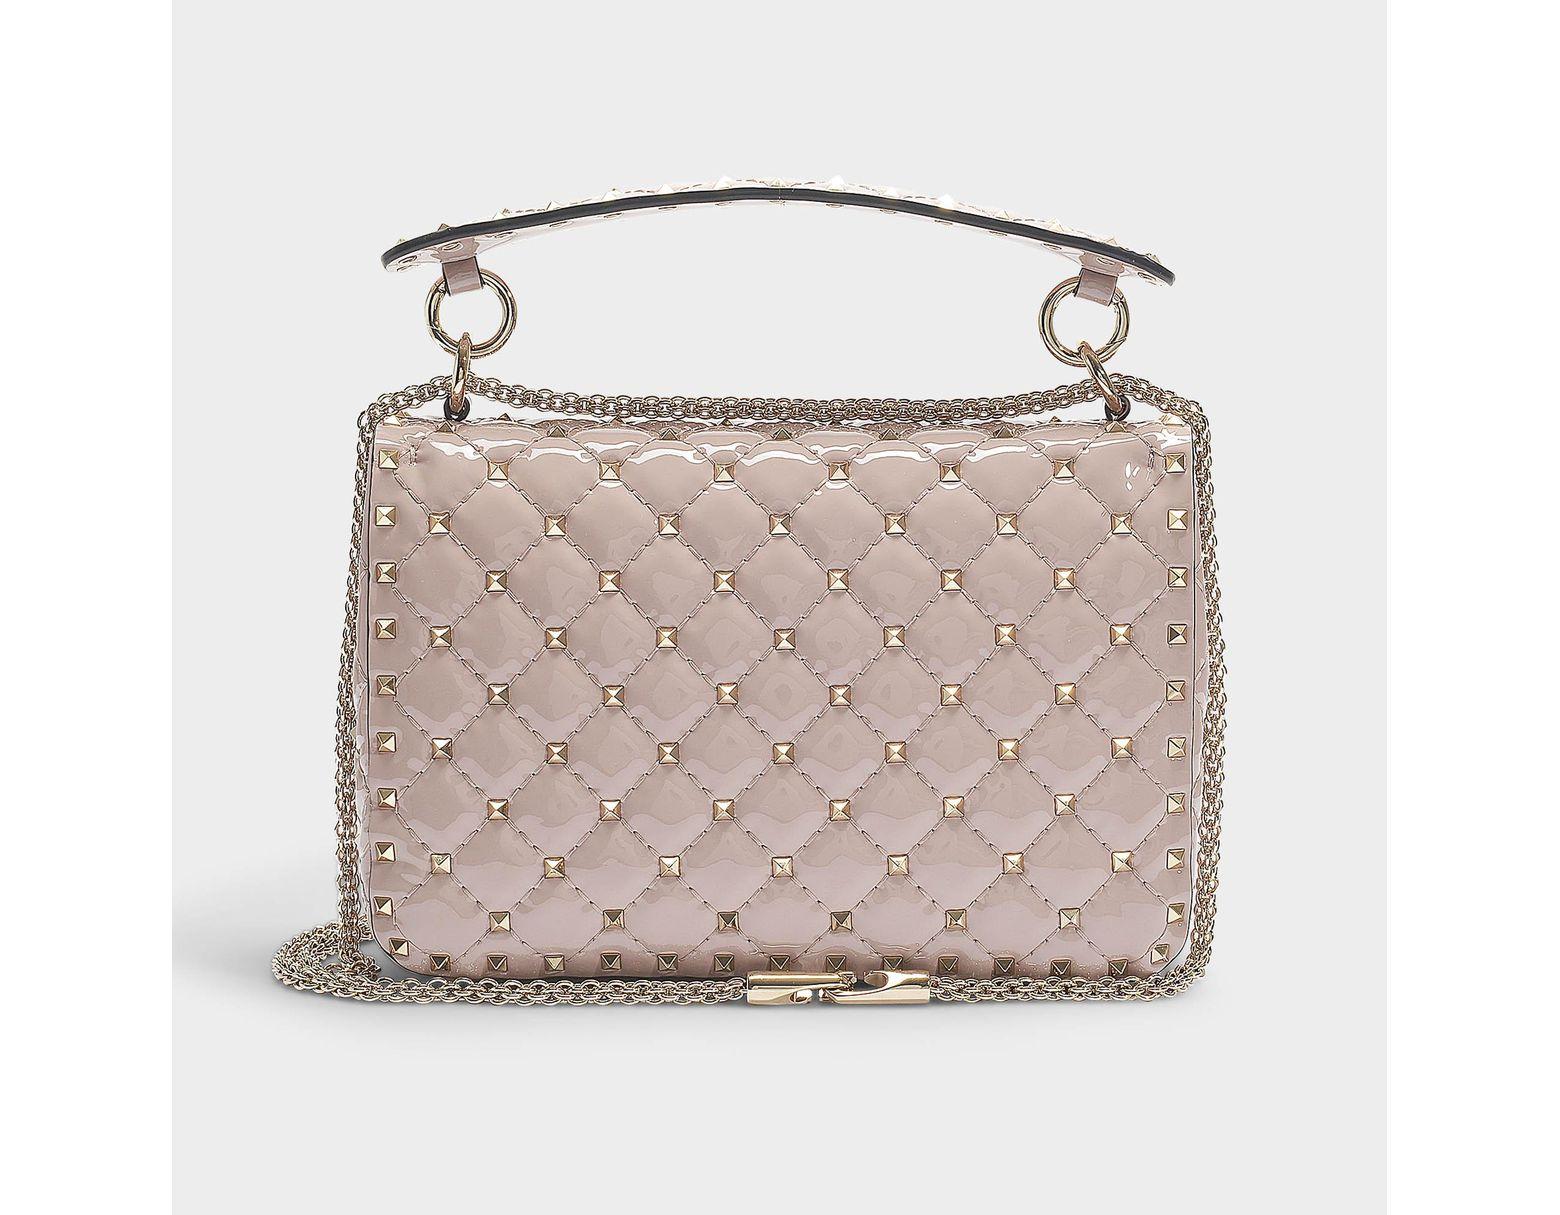 946baca42a1 Valentino Rockstud Spike Medium Shoulder Bag In Poudre Patent Calfskin in  Pink - Lyst